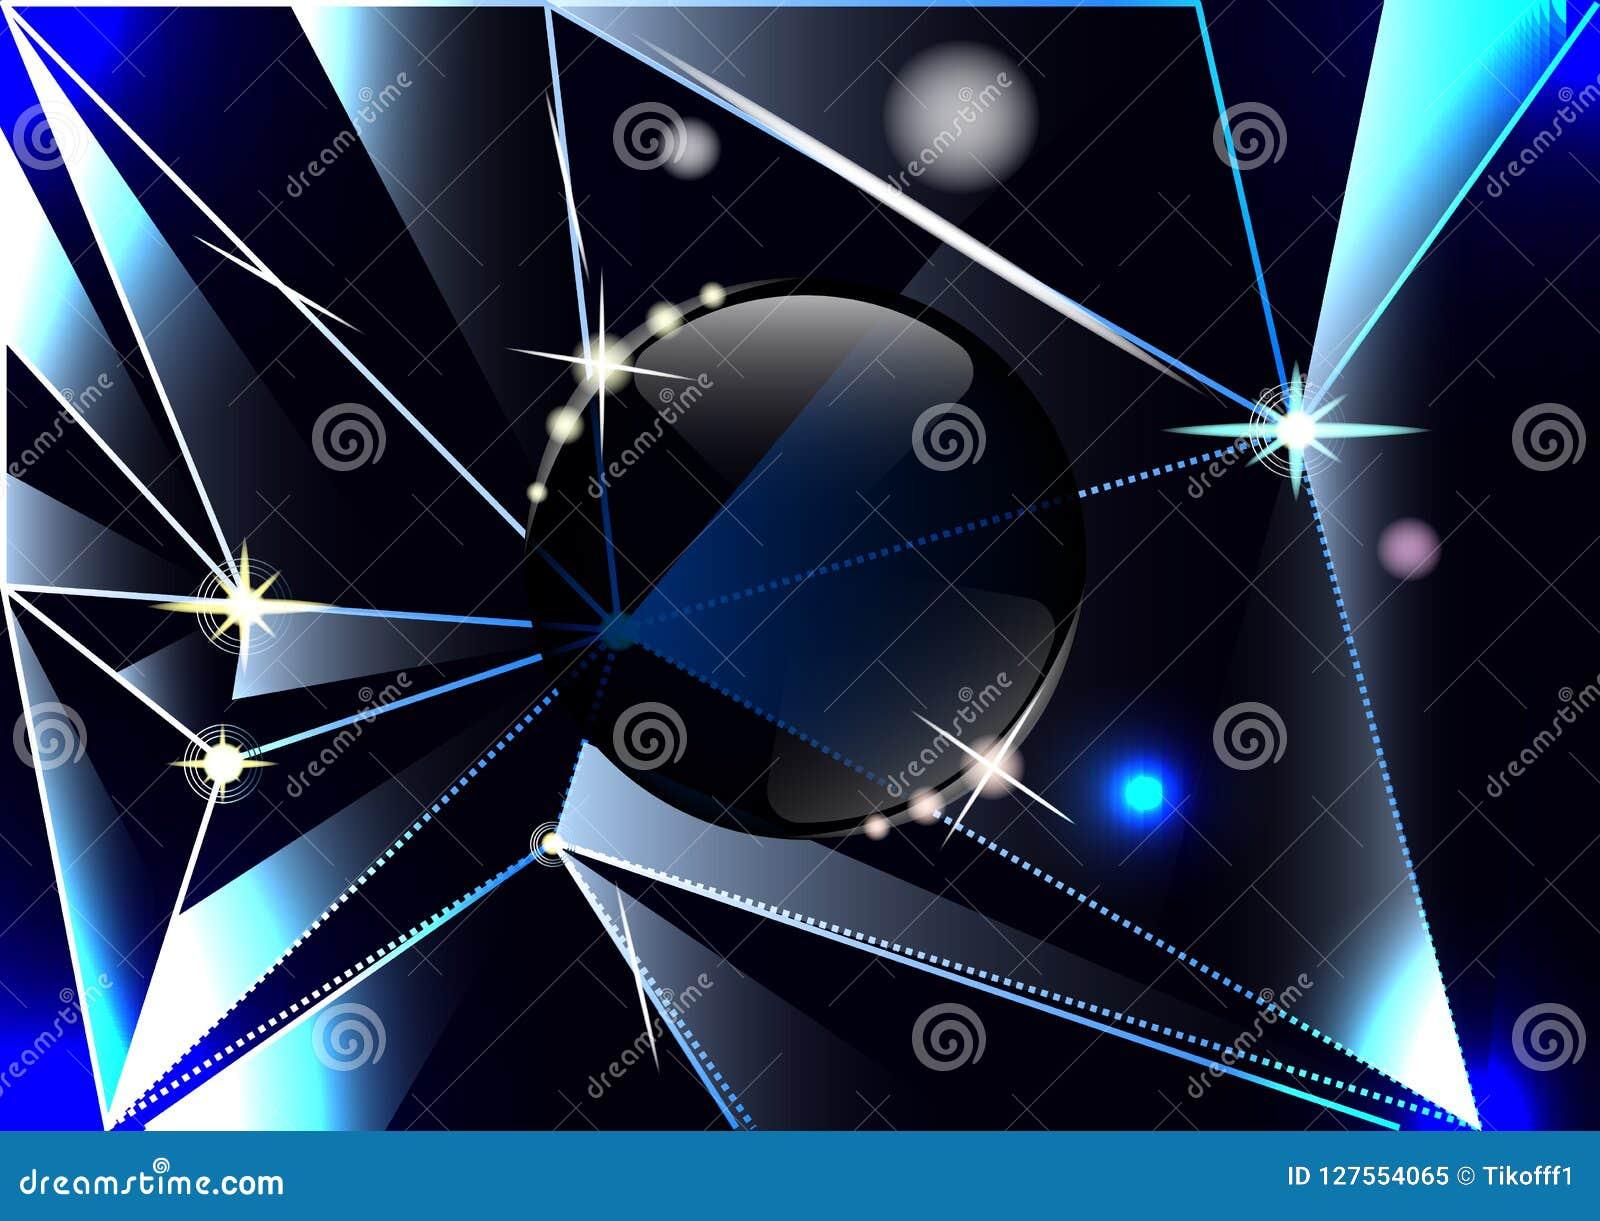 Triangular shards of dark glass, Prisms, glass ball, abstract background